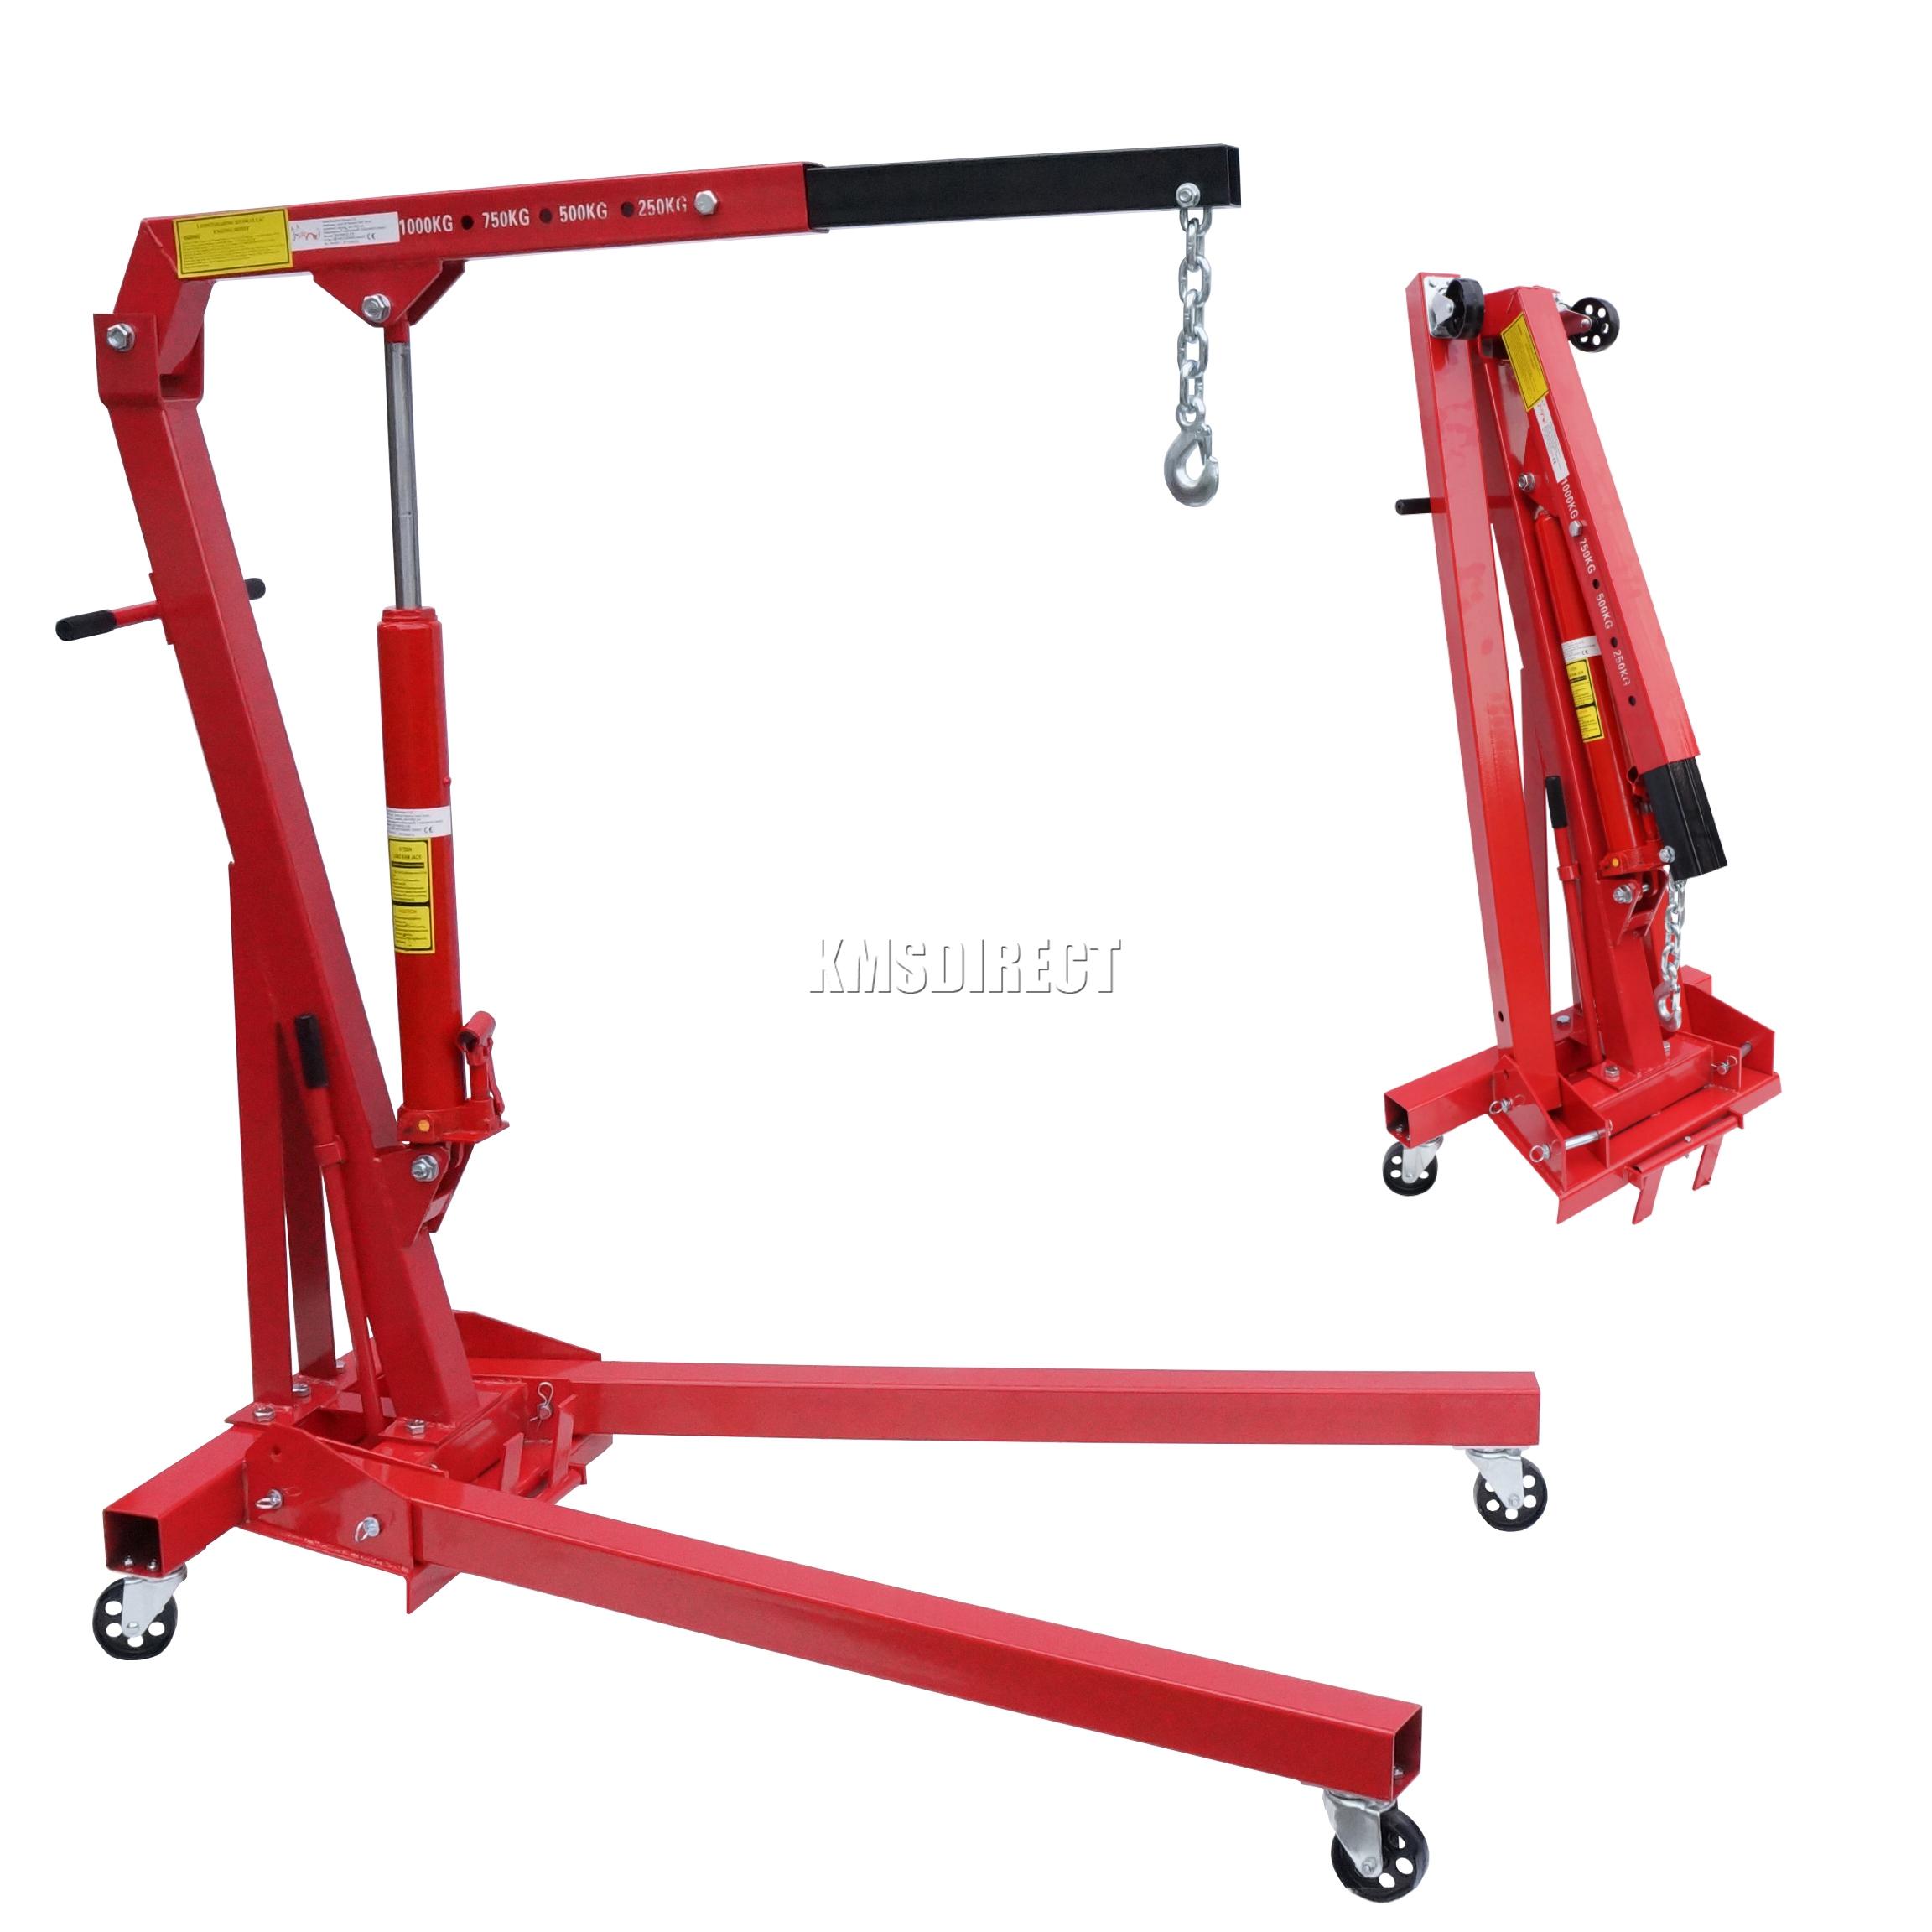 Folding Jack Stands >> FoxHunter Red 1 Ton Tonne Hydraulic Folding Engine Crane Stand Hoist lift Jack | eBay